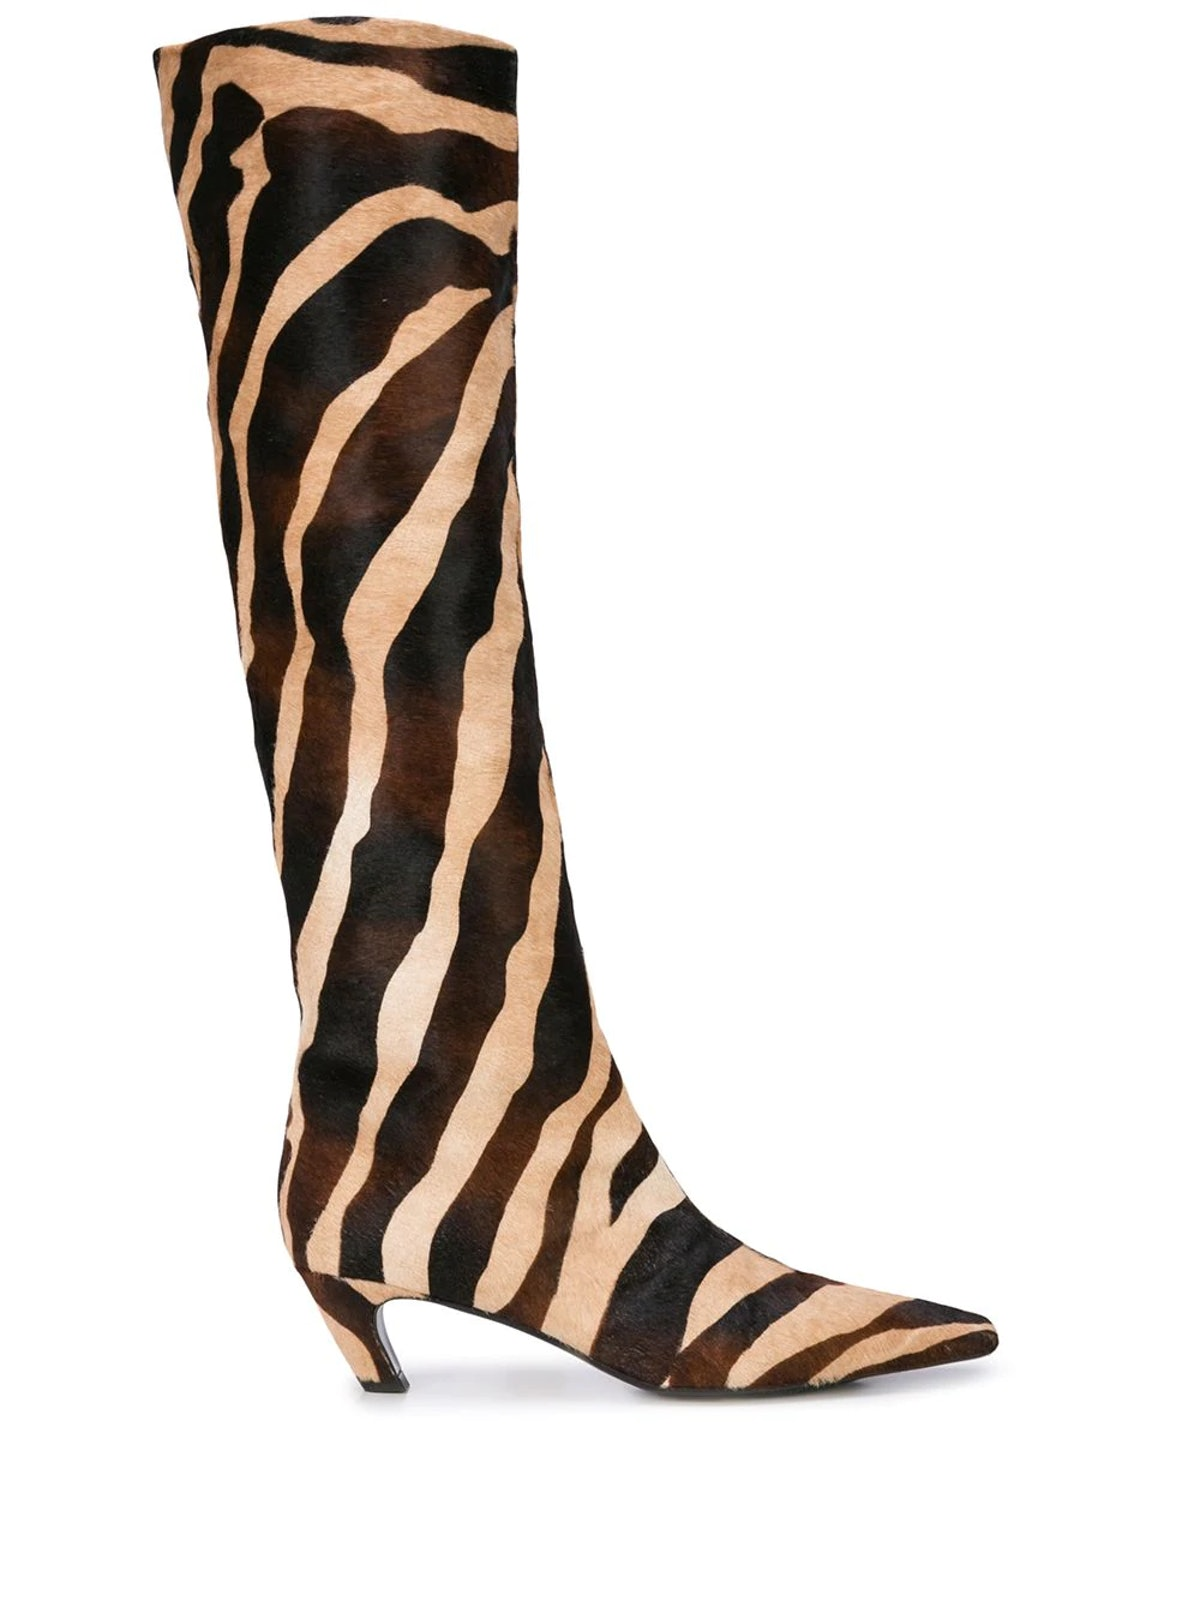 The Knee-High Zebra Print Boots